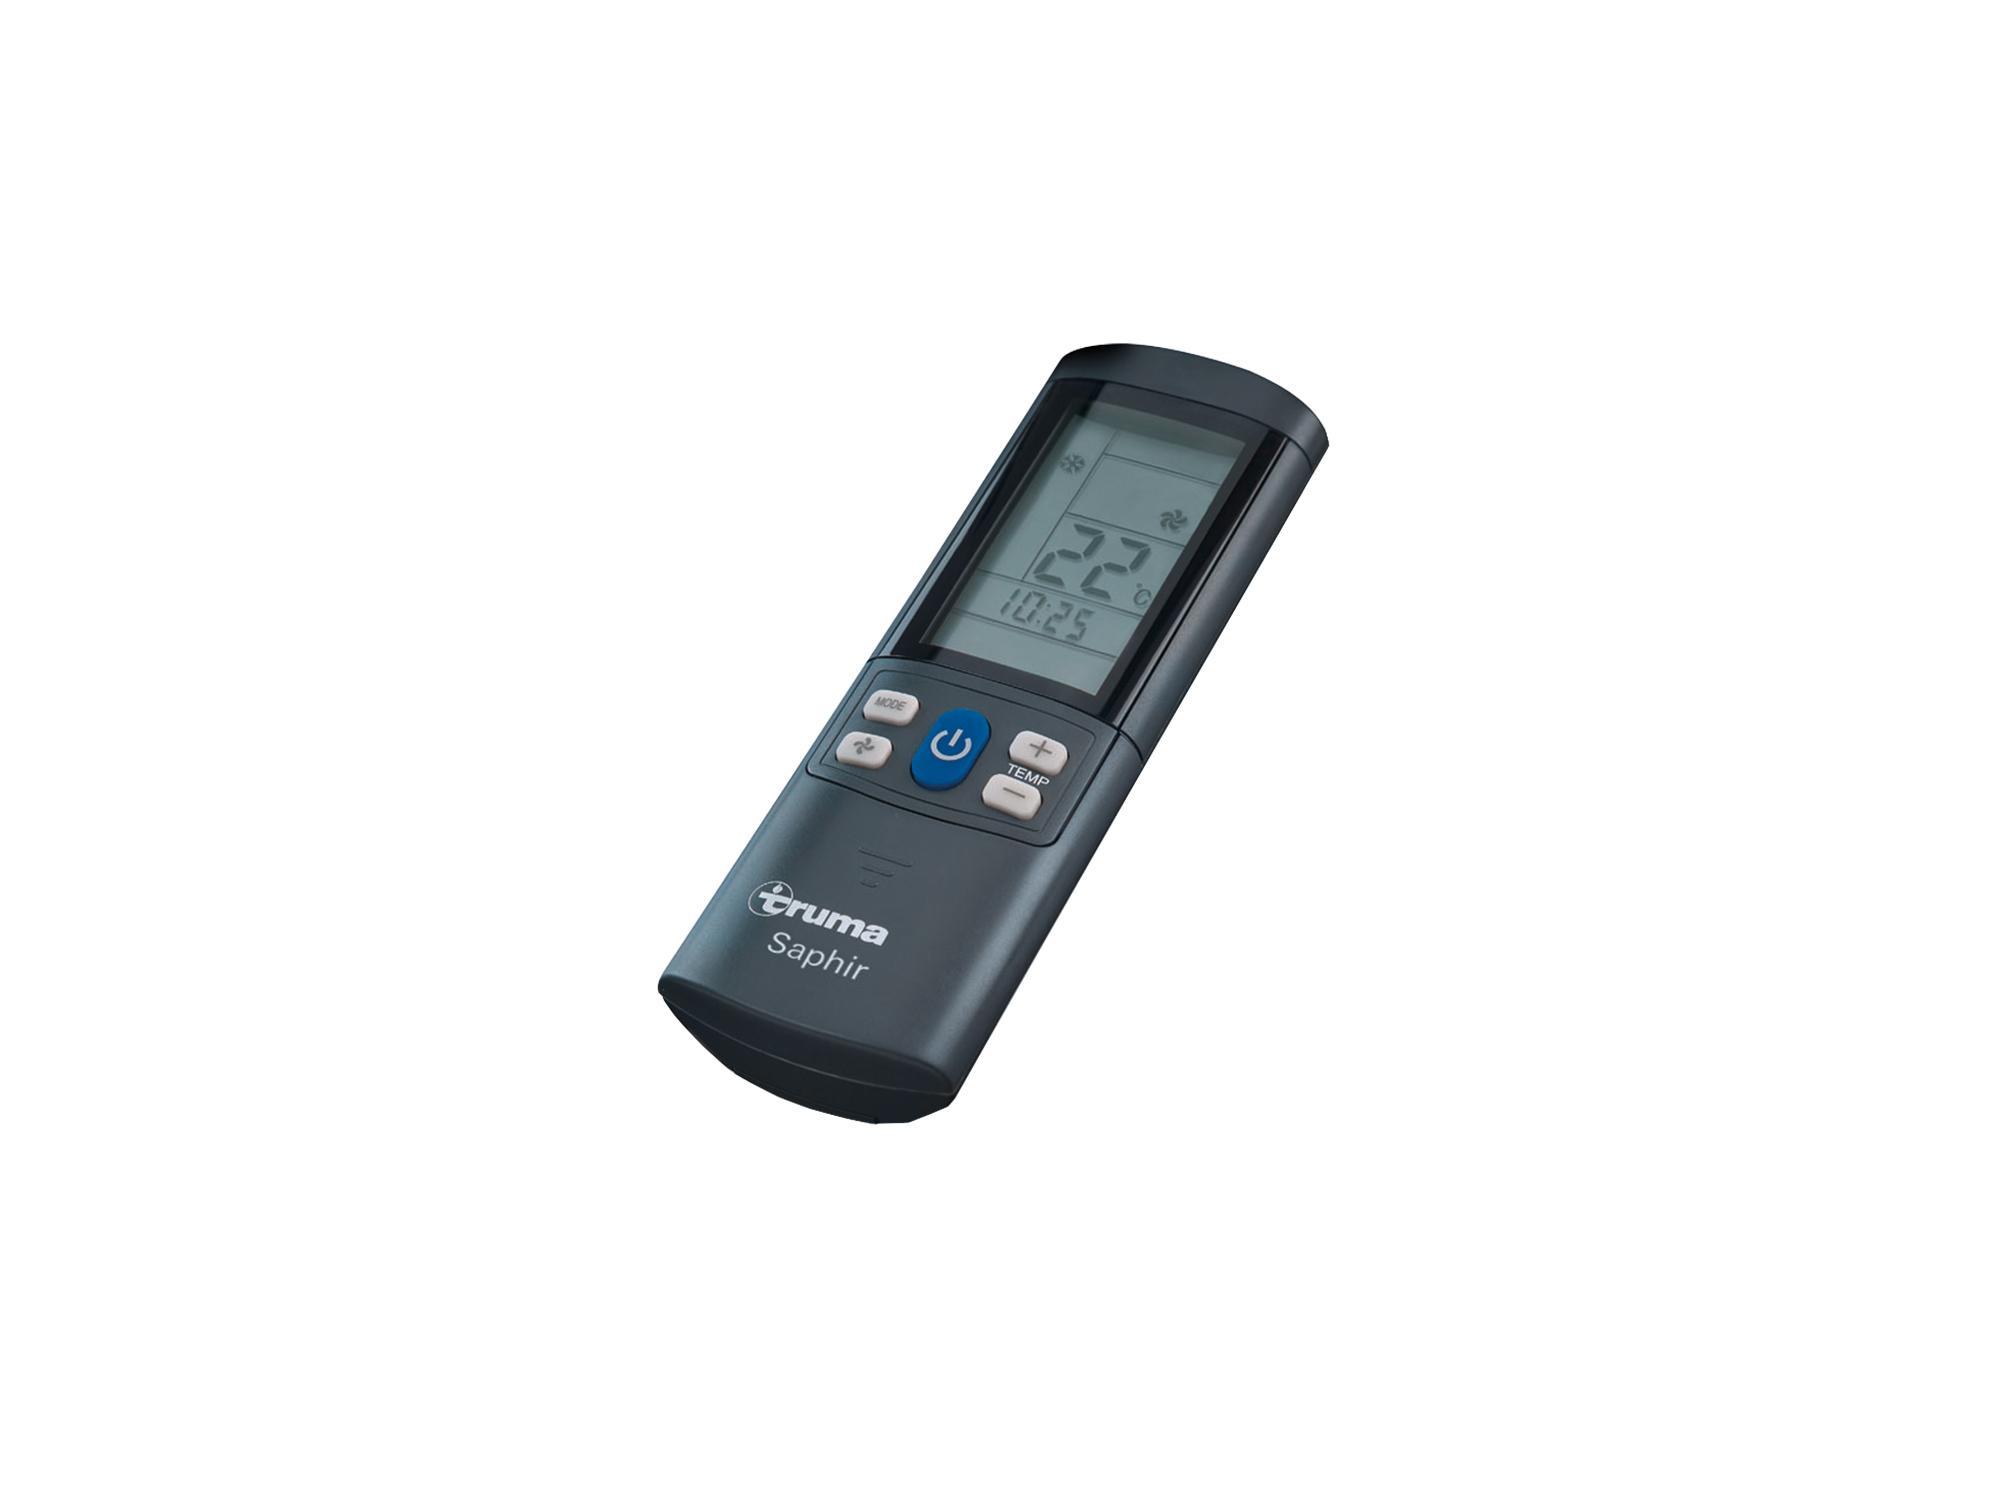 Truma Saphir vario remote control